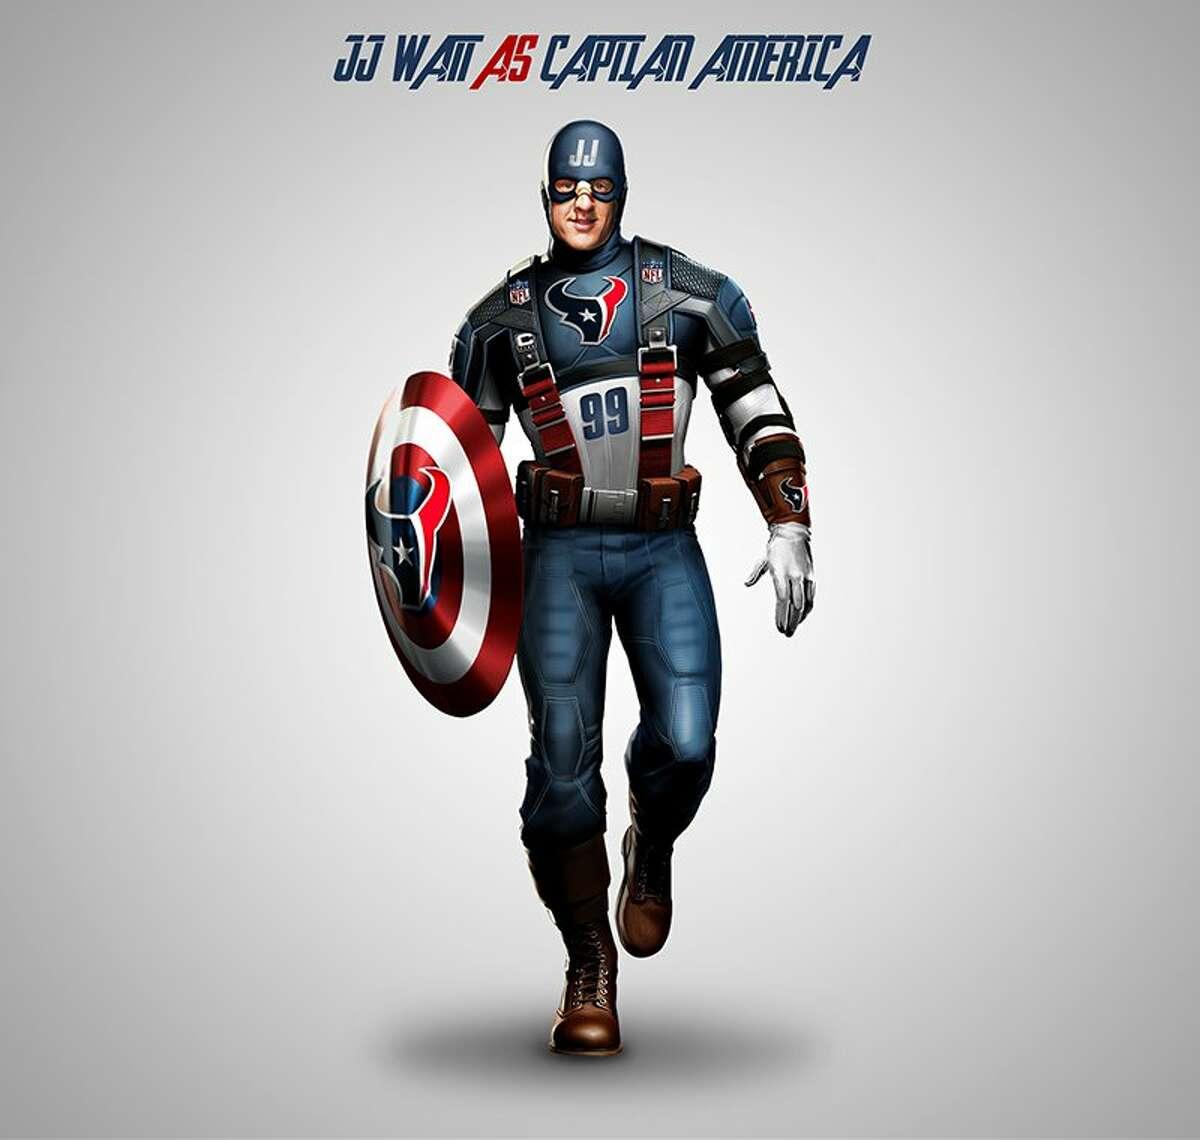 J.J. Watt as Captain America